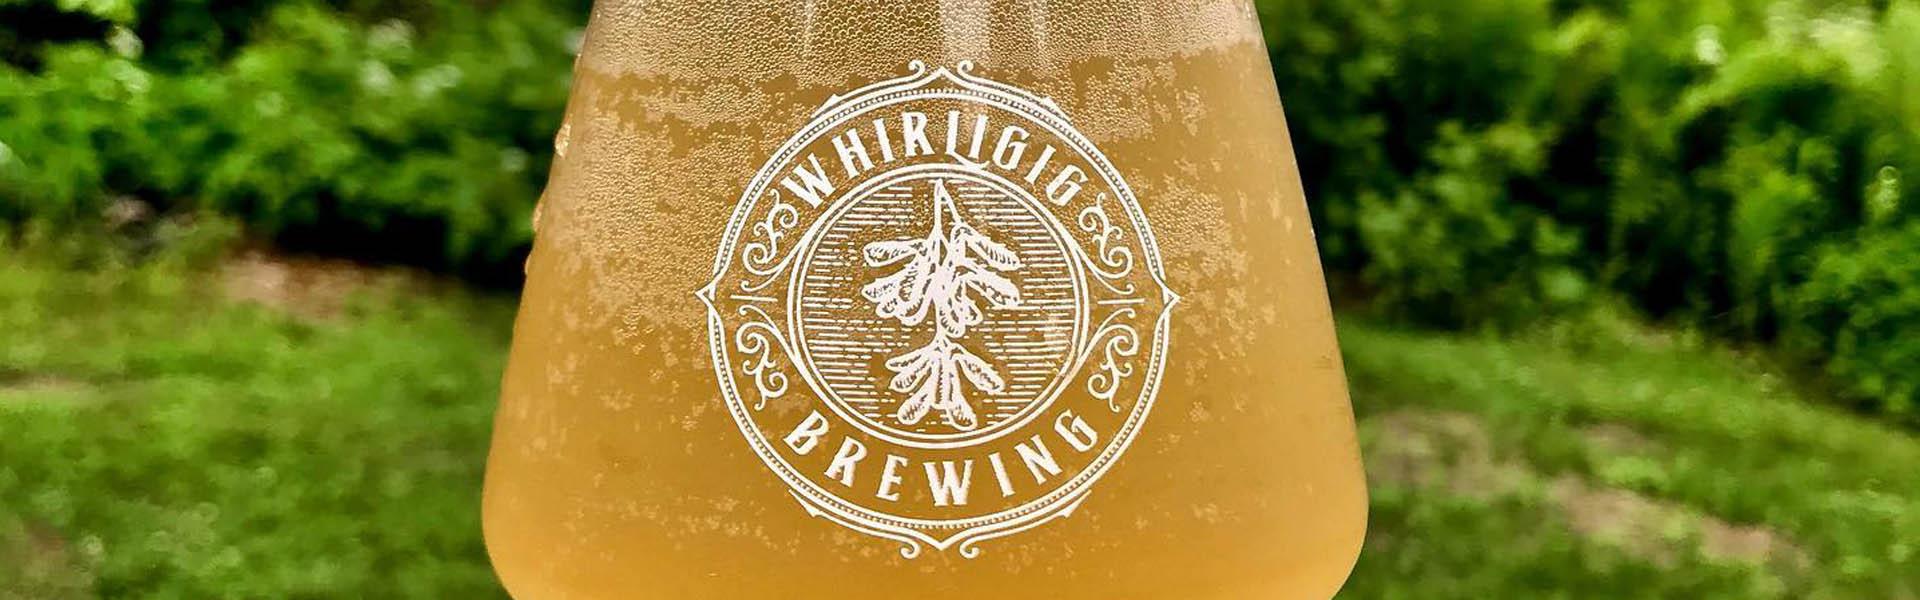 WhirliGig_Brewing_Header